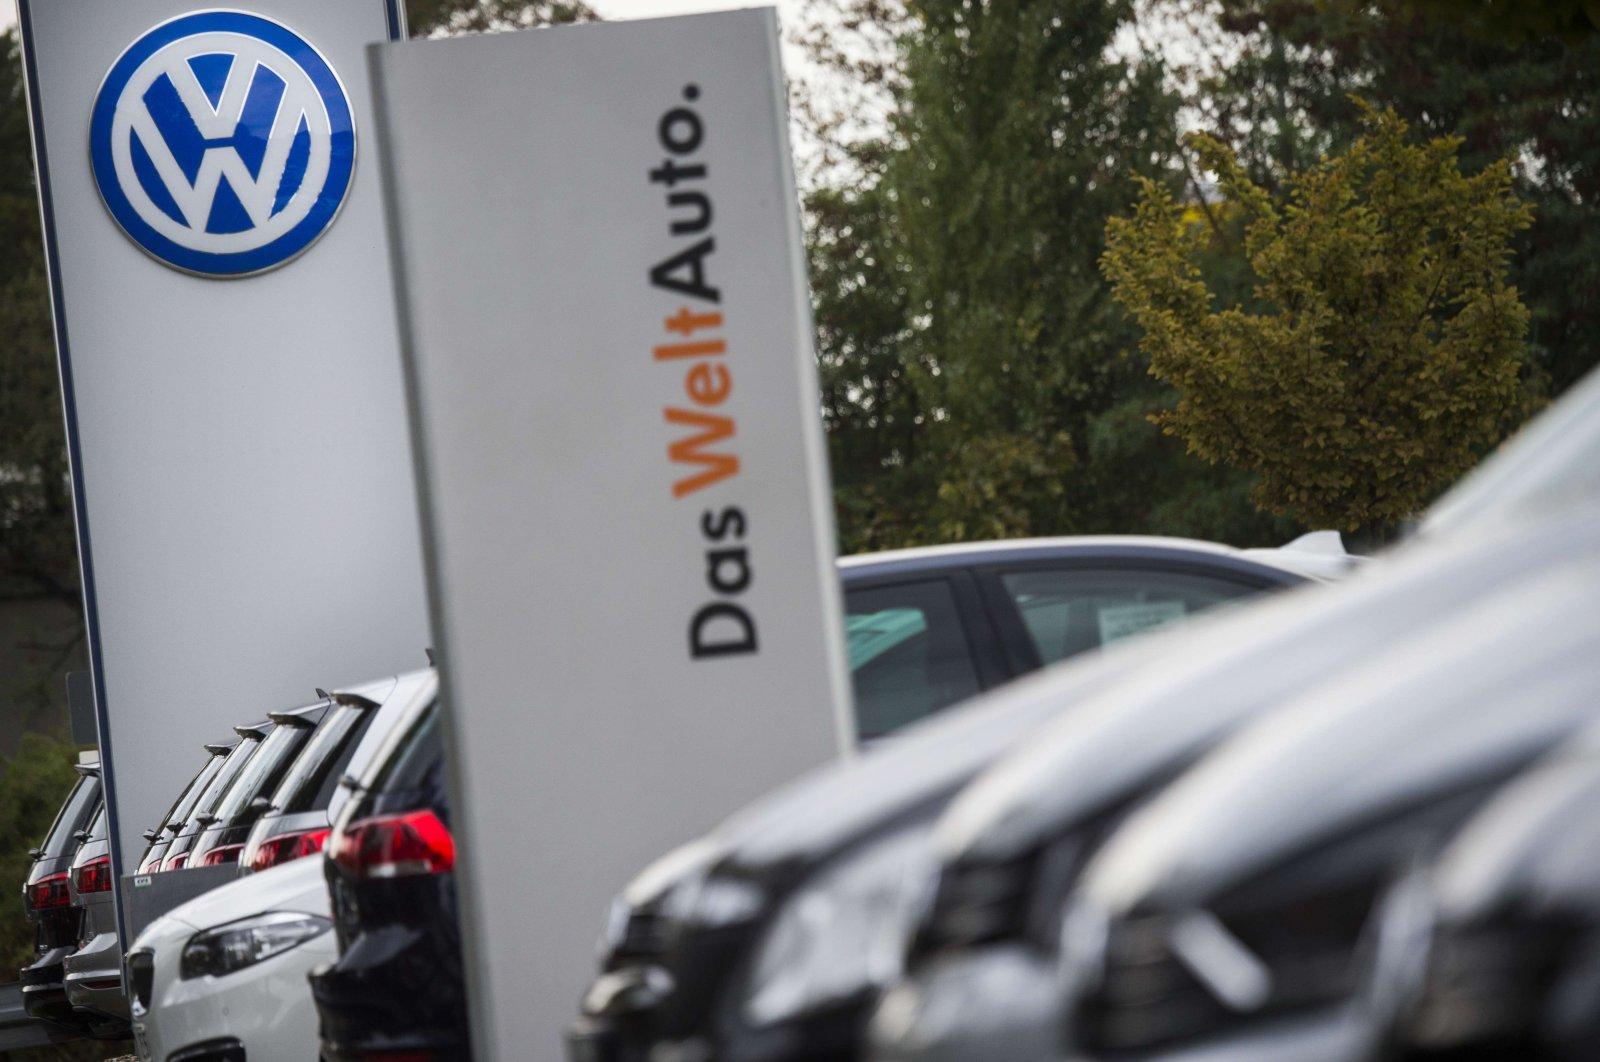 German carmaker Volkswagen logo is seen at a VW dealer in Berlin, Sept. 22, 2015. (AFP Photo)